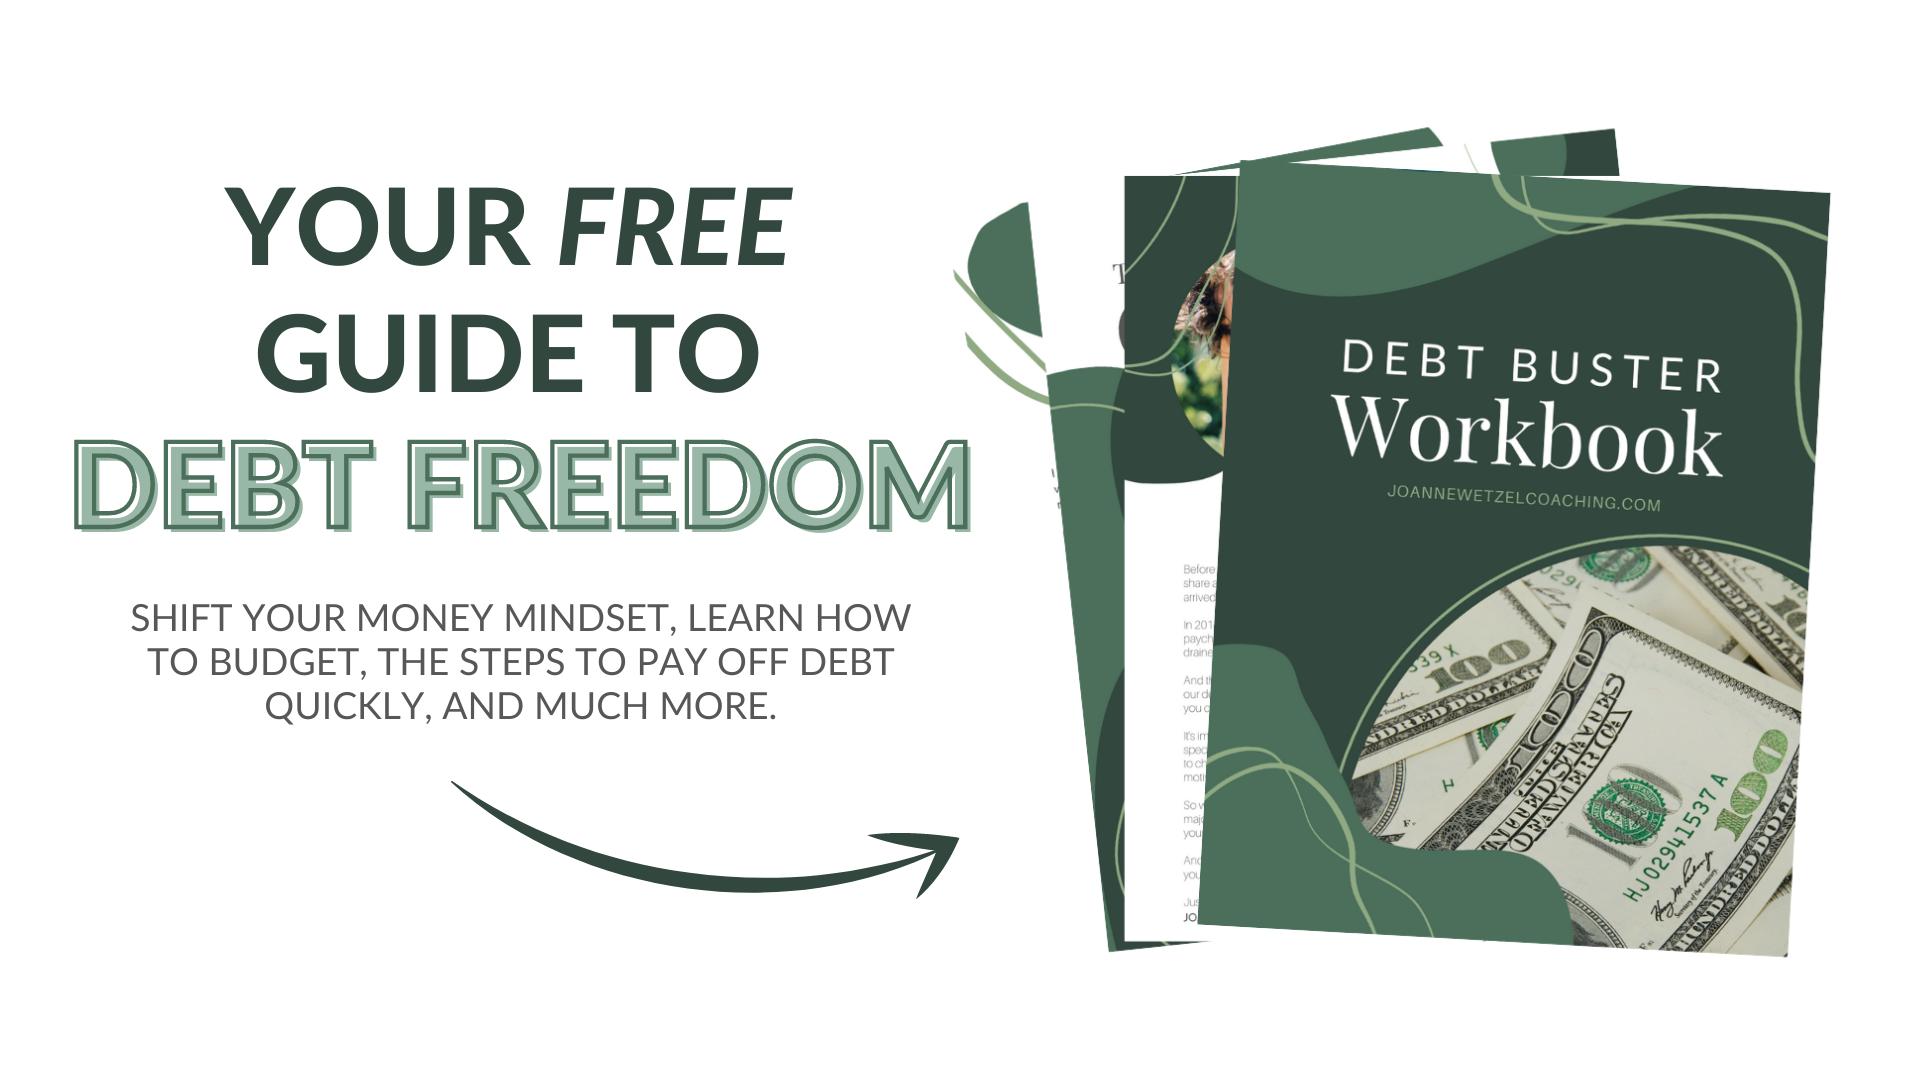 paying-off-debt-becoming-debt-free-workbook-joanne-wetzel-money-mindset-coach